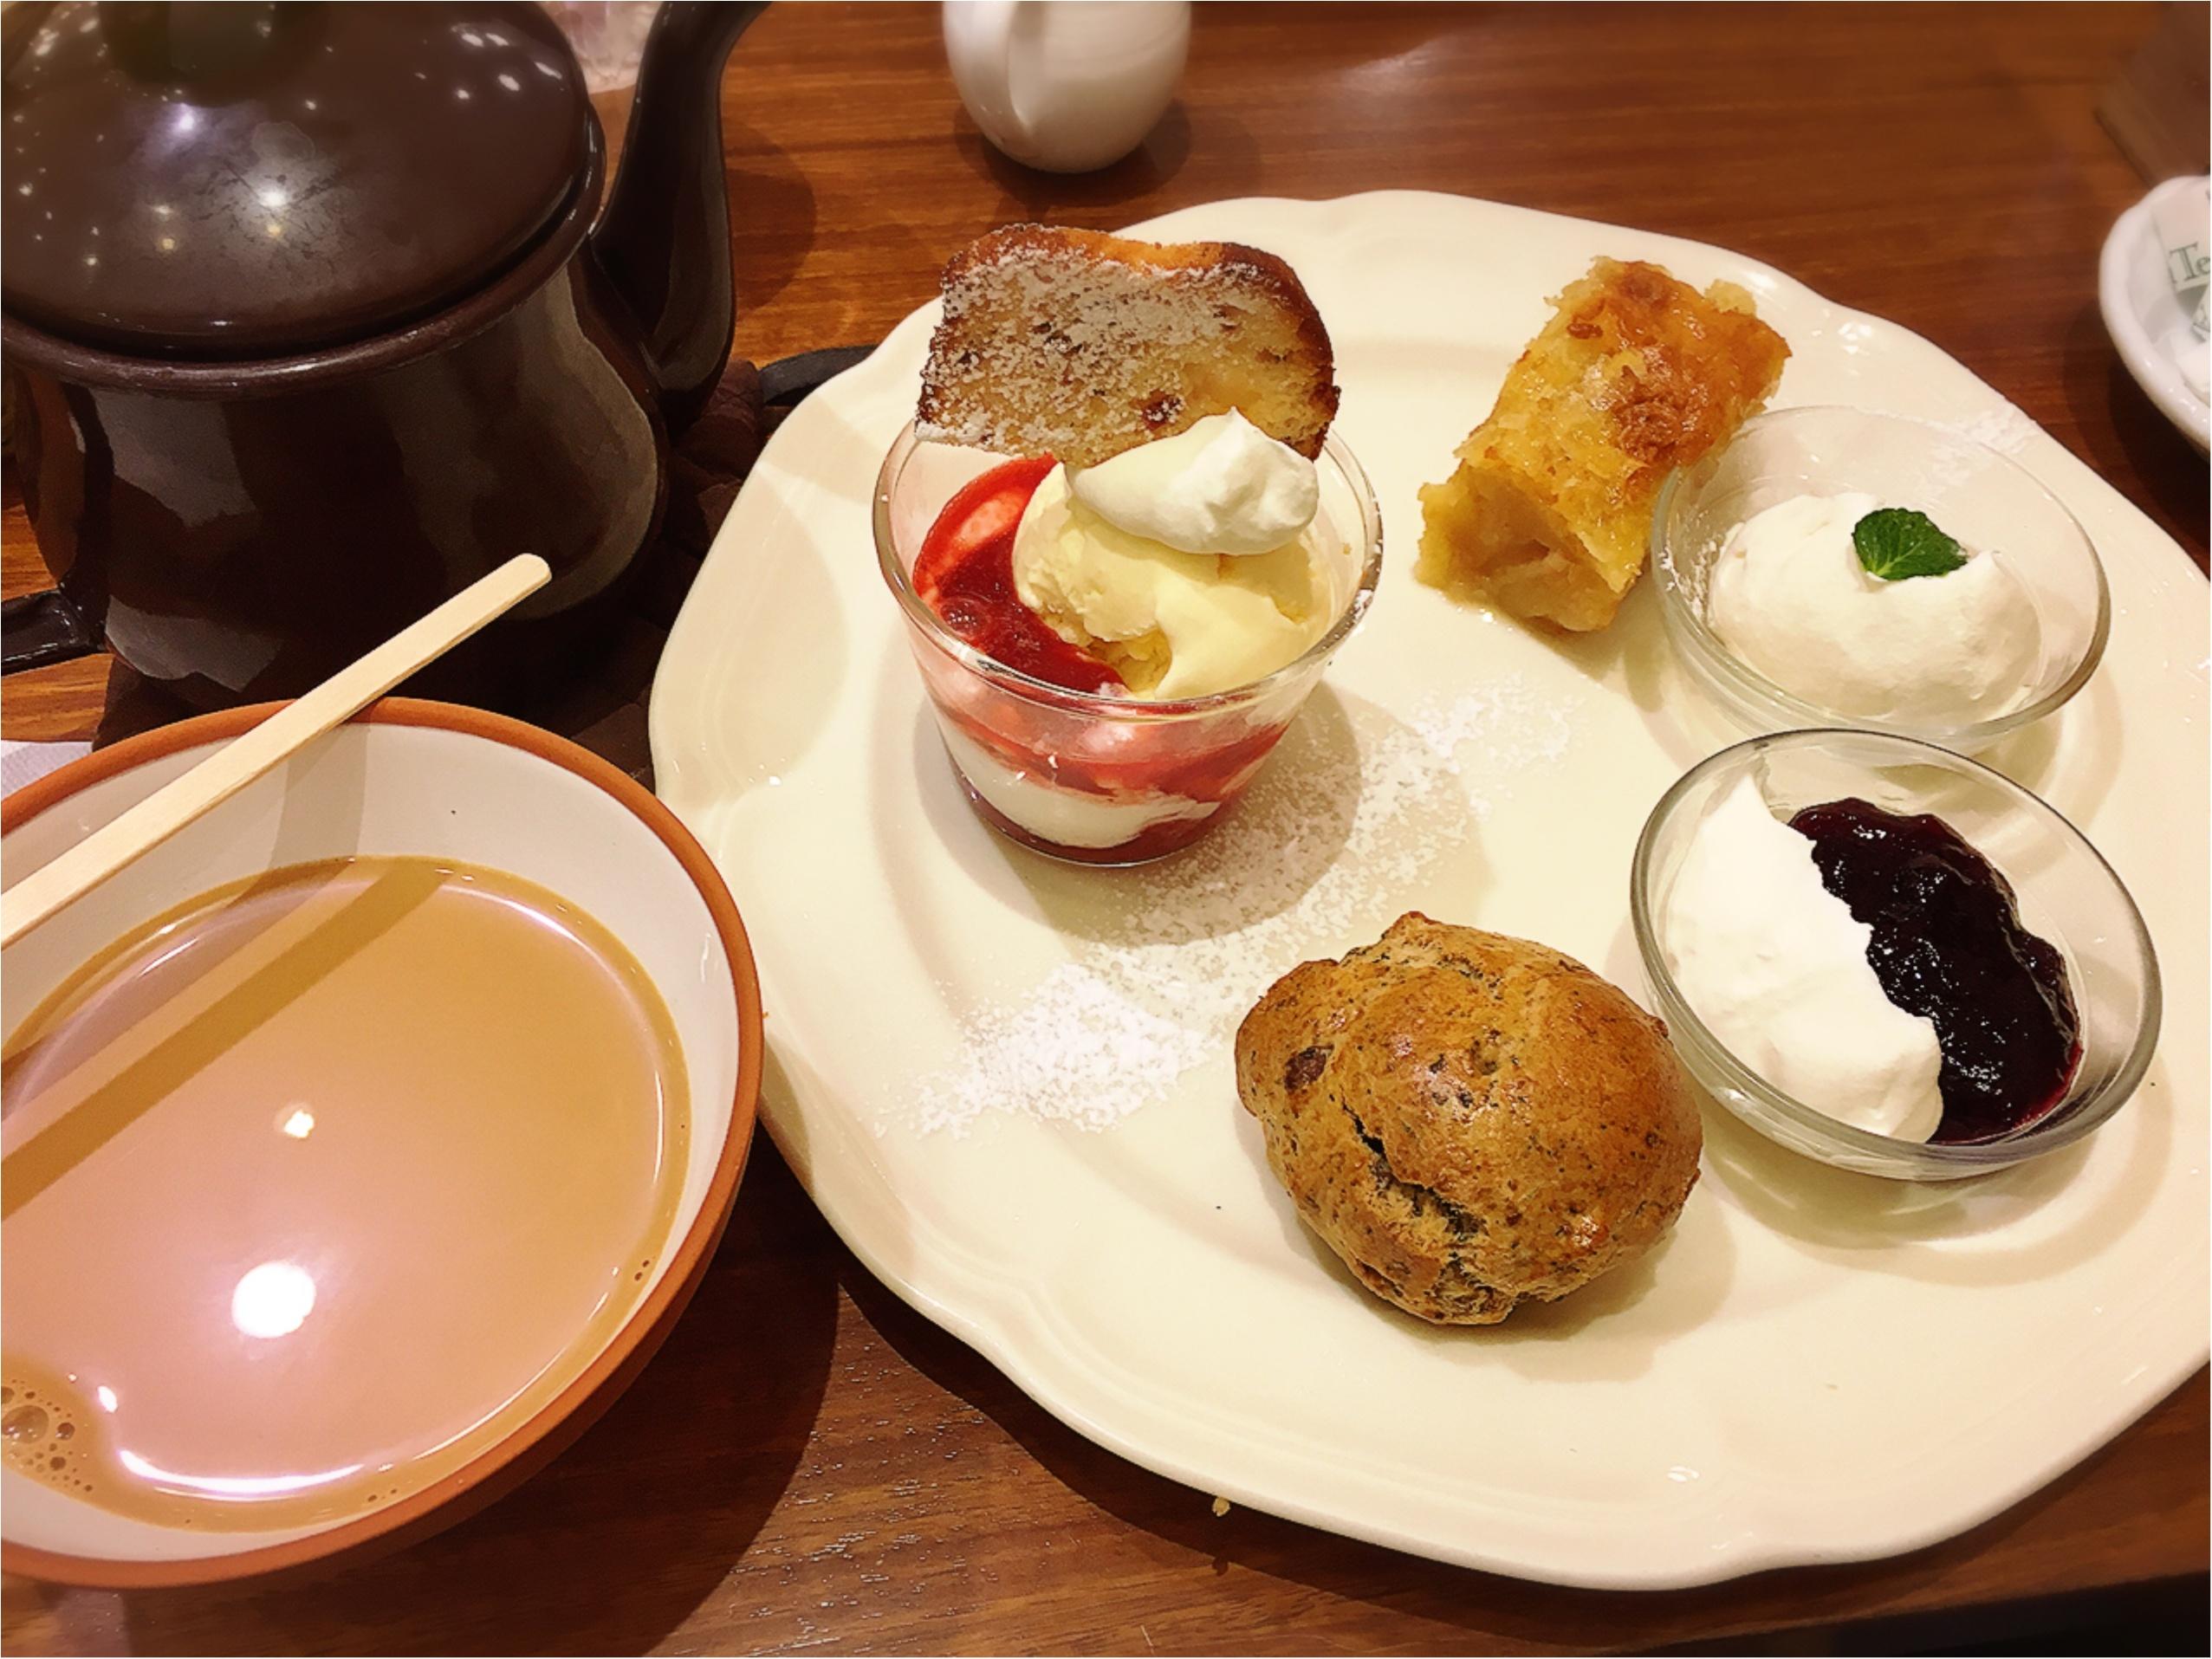 Afternoon Tea tearoom(アフタヌーンティーティールーム)のアフタヌーンティーセットがすき。_7